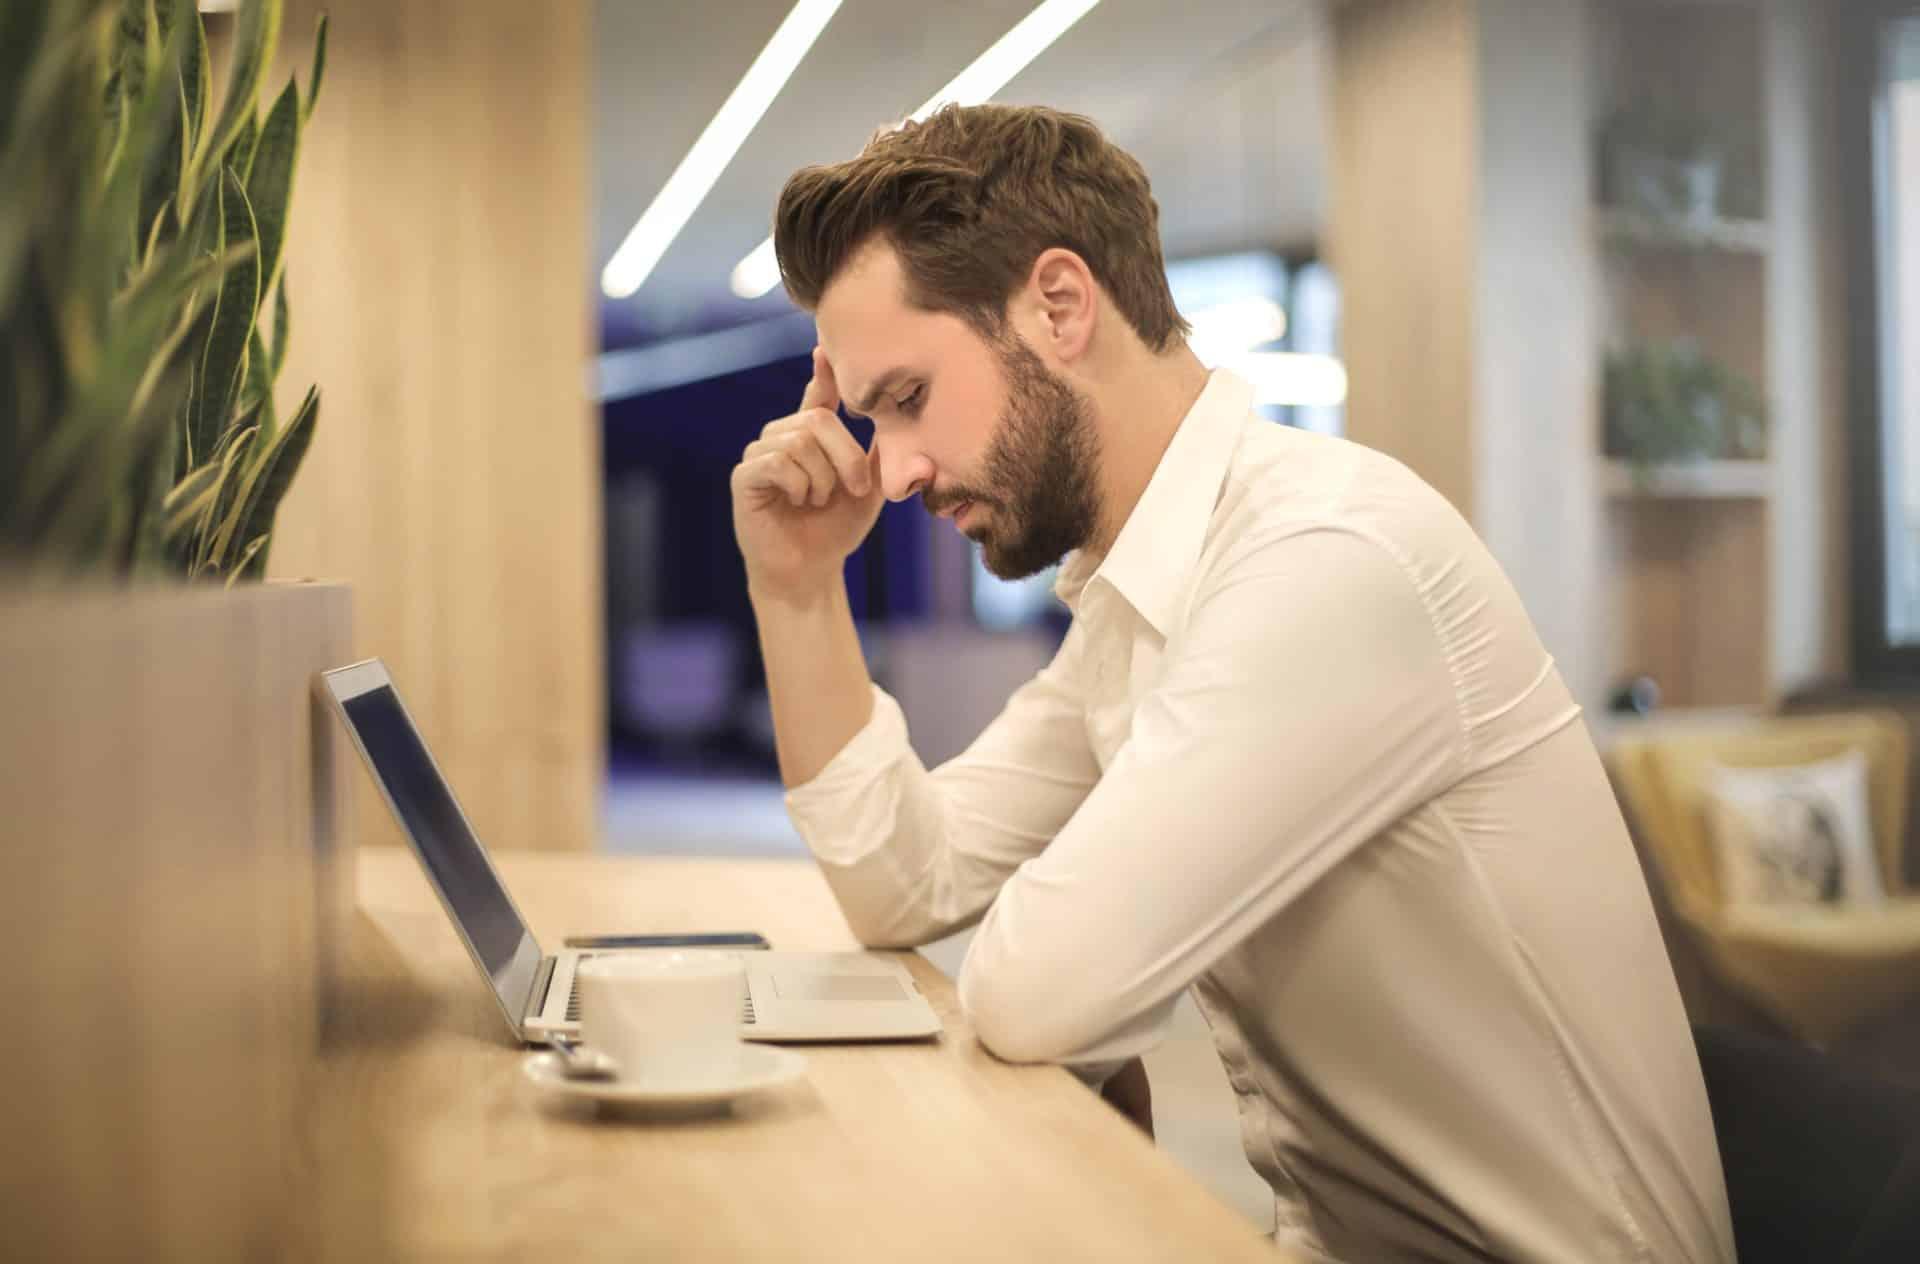 Firing an Employee with a Negative Attitude